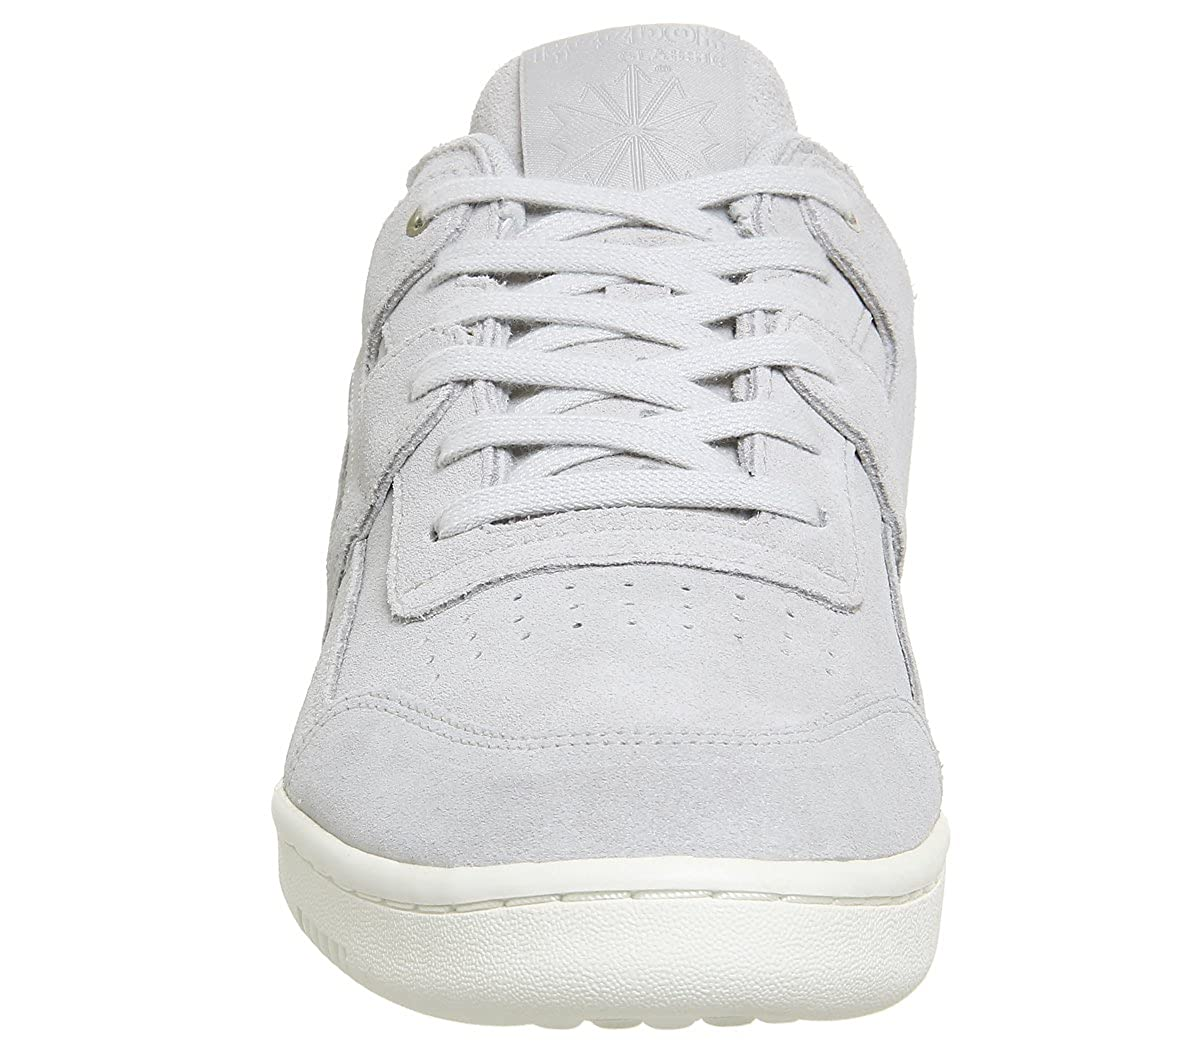 65cbee9bd654 Reebok Men s Workout Plus Trainers  Amazon.co.uk  Shoes   Bags